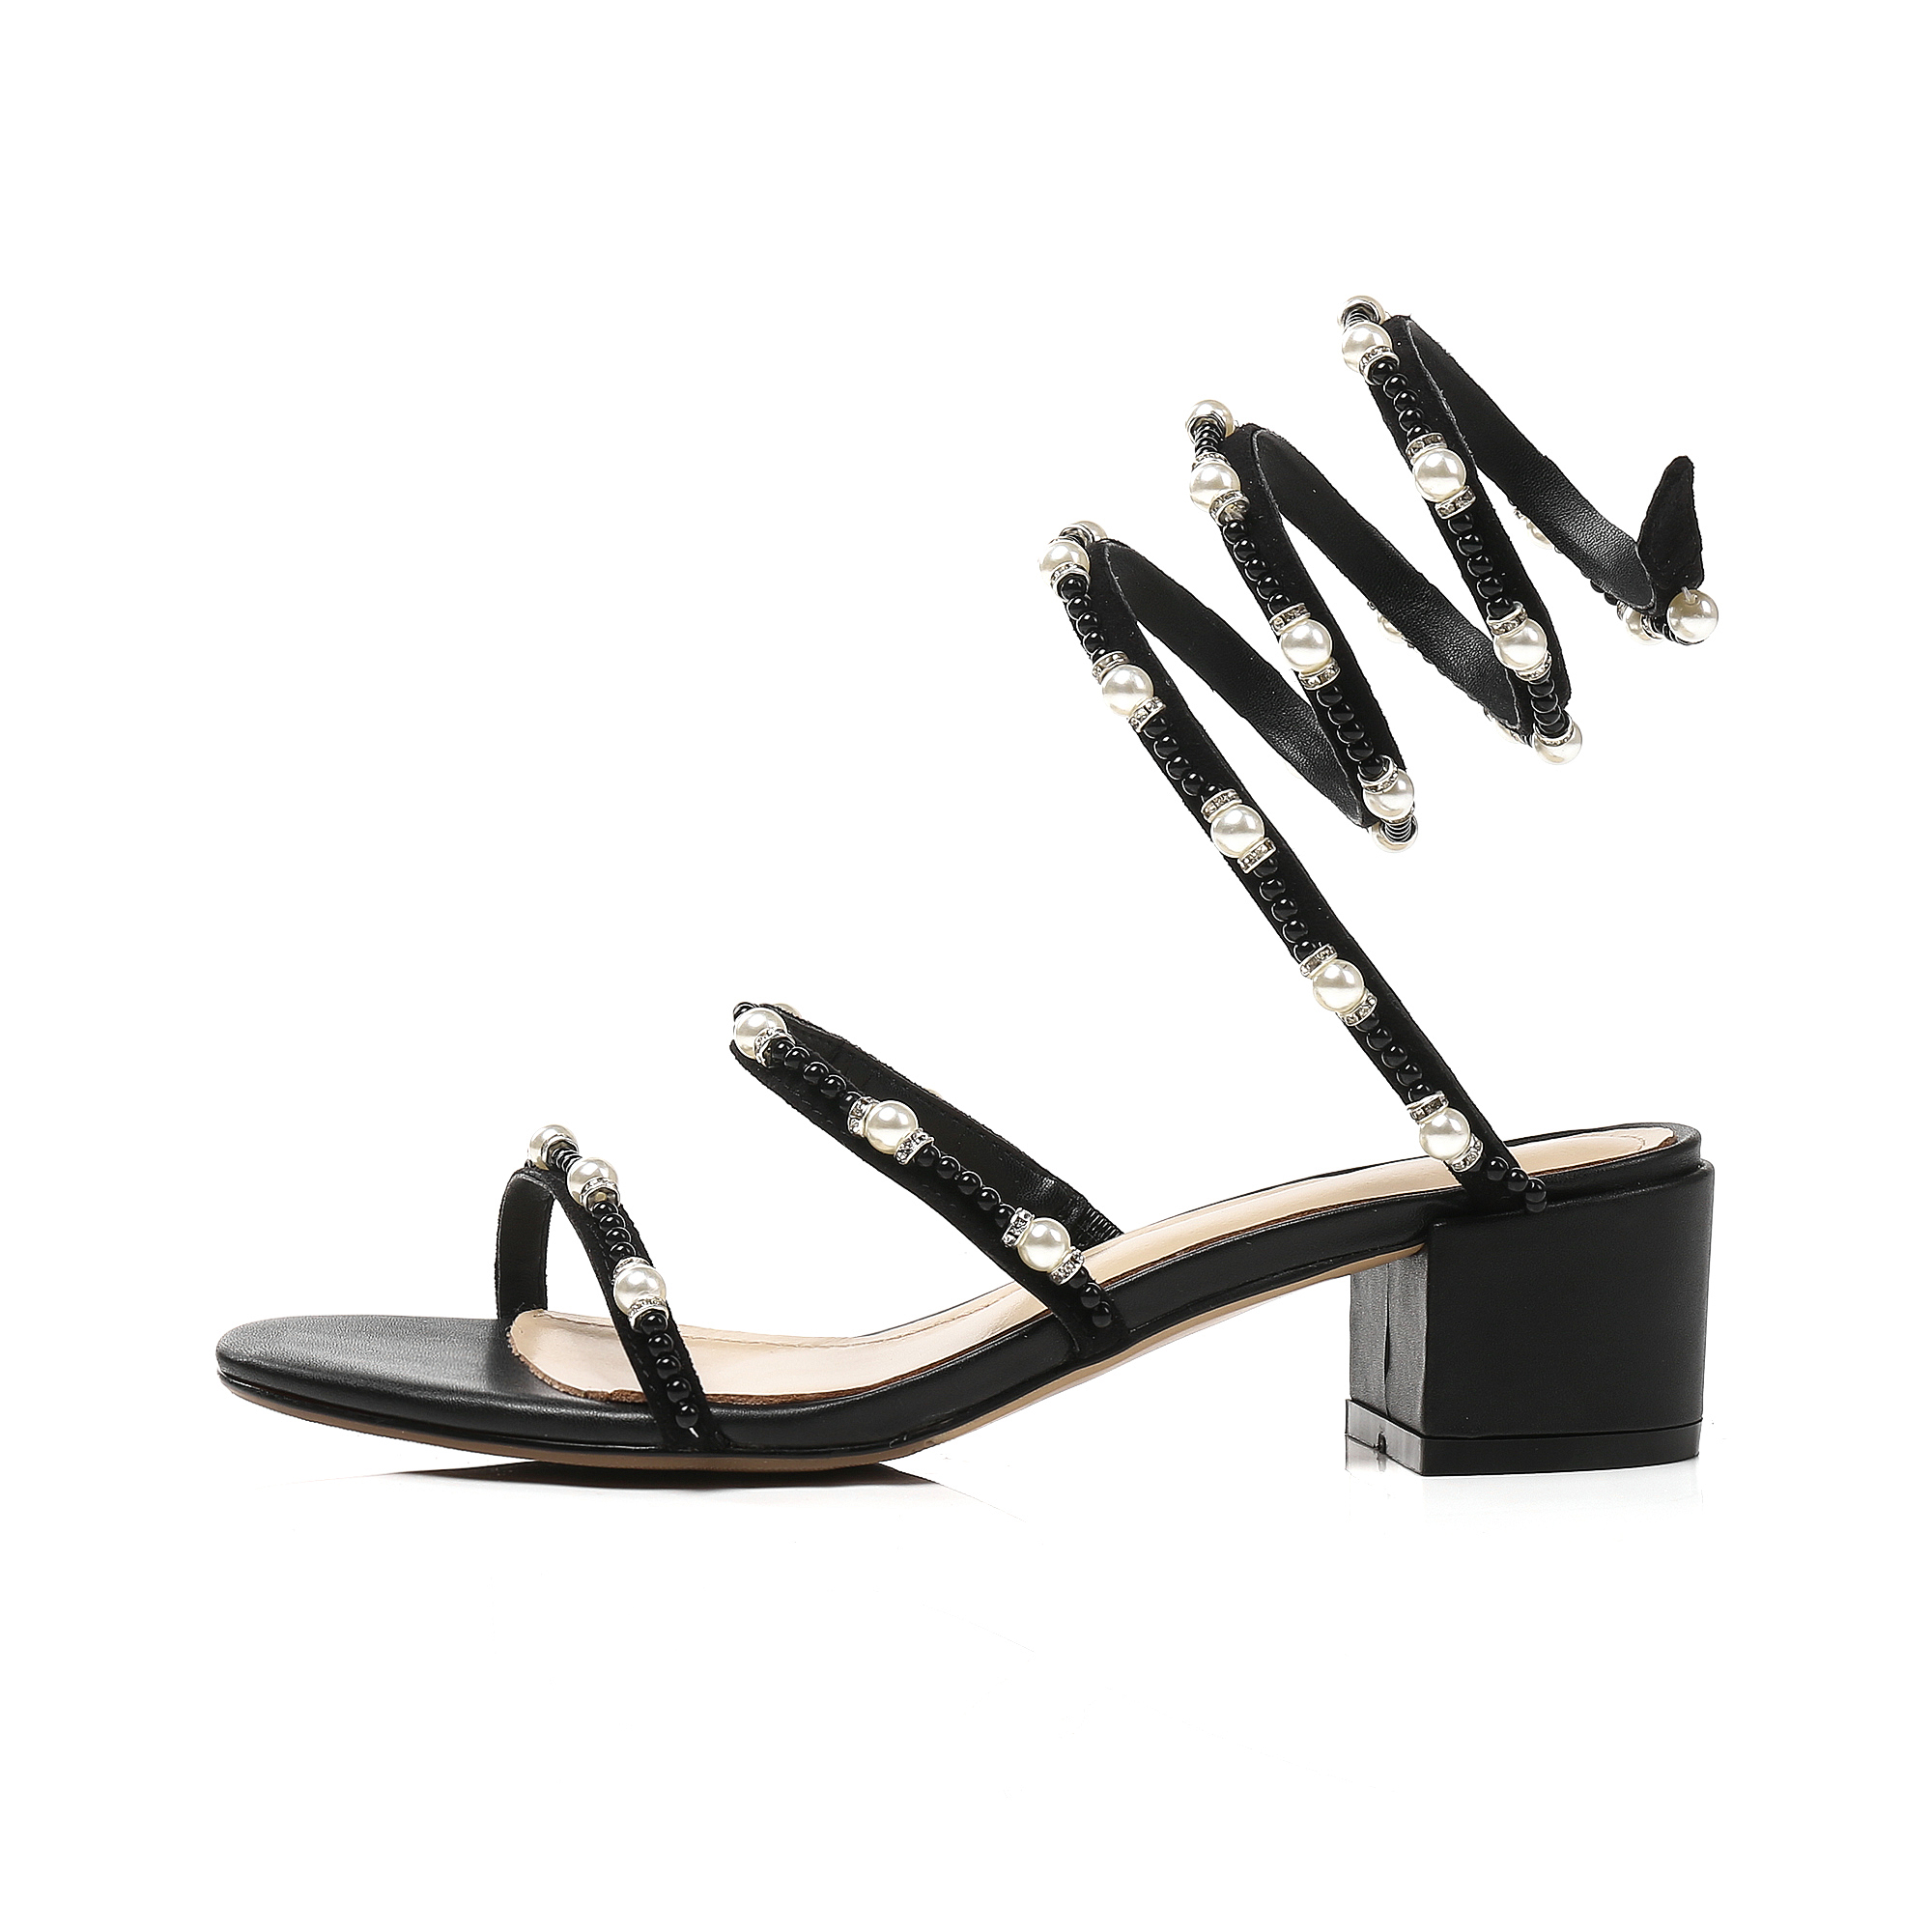 2313798a5 US  60 - Arden Furtado 2018 summer square heels 5cm crystal gladiator  sandals ankle strap fashion rhinestone pearls woman shoes ladies -  www.ardenfurtado. ...